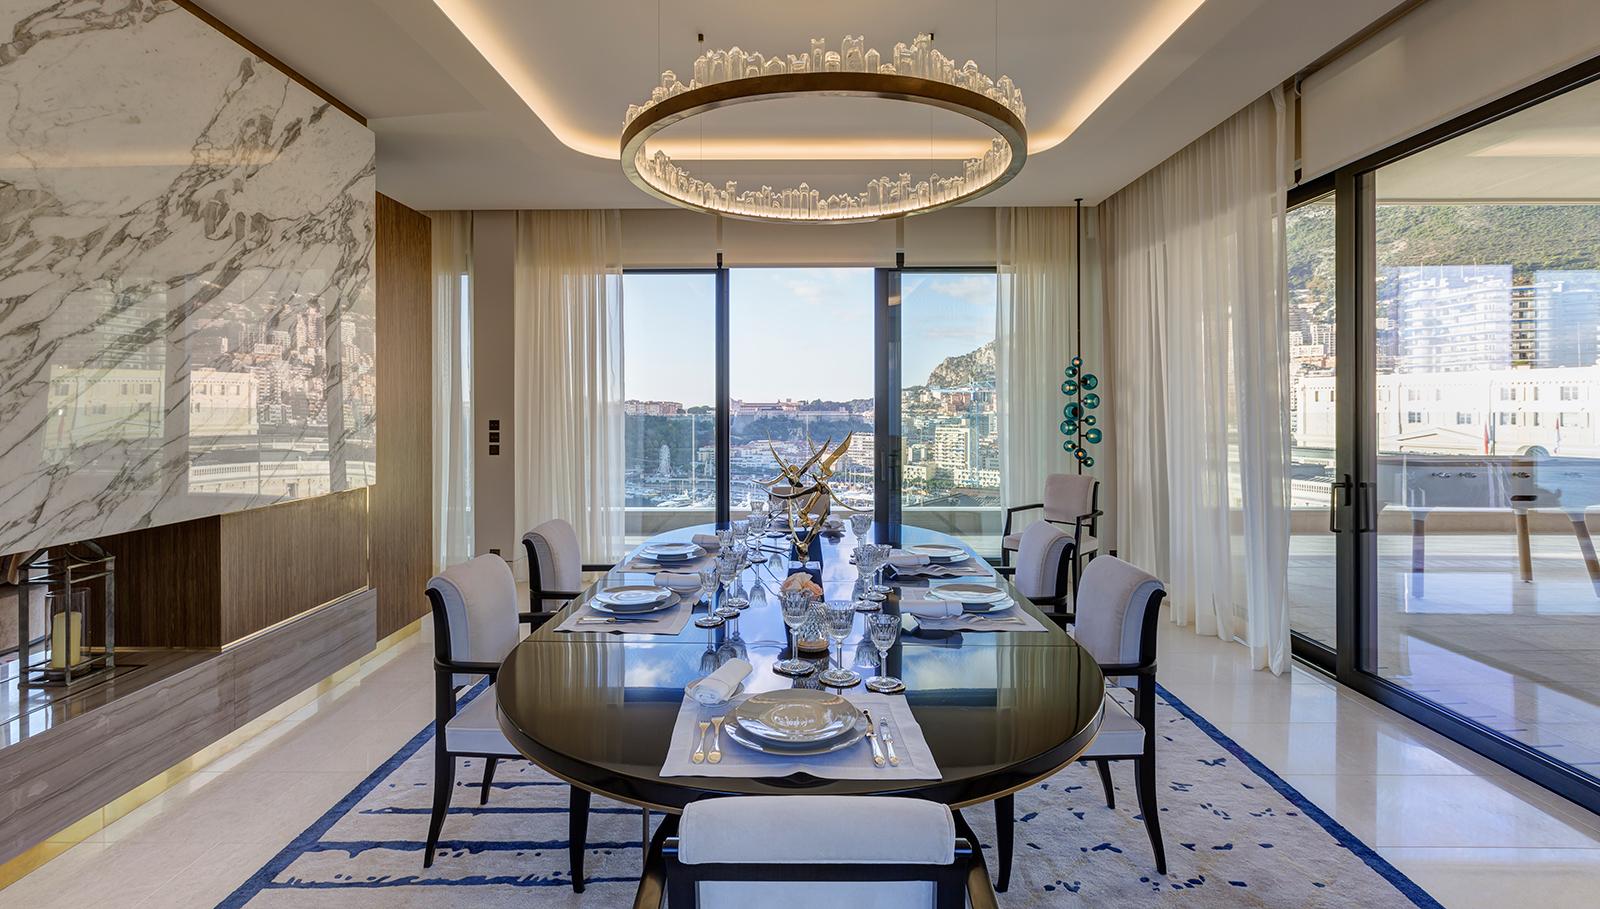 Top 5 Design Hotel for 2019 - Architectural Digest - Luxury World